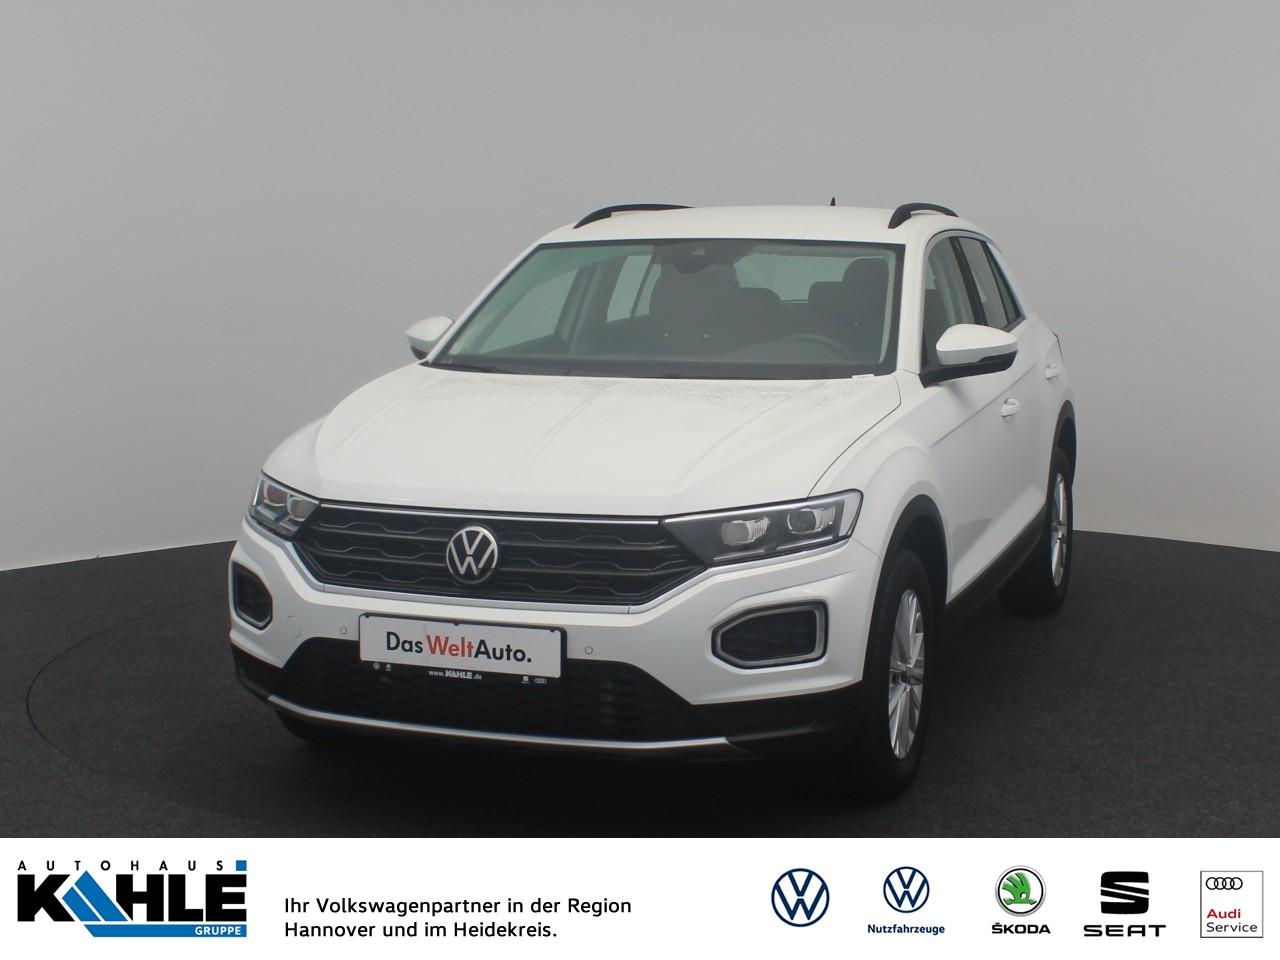 Volkswagen T-Roc 1.0 TSI Style Klima LED Ready2 Discover Dachreling Sitzh. PDC ACC, Jahr 2021, Benzin